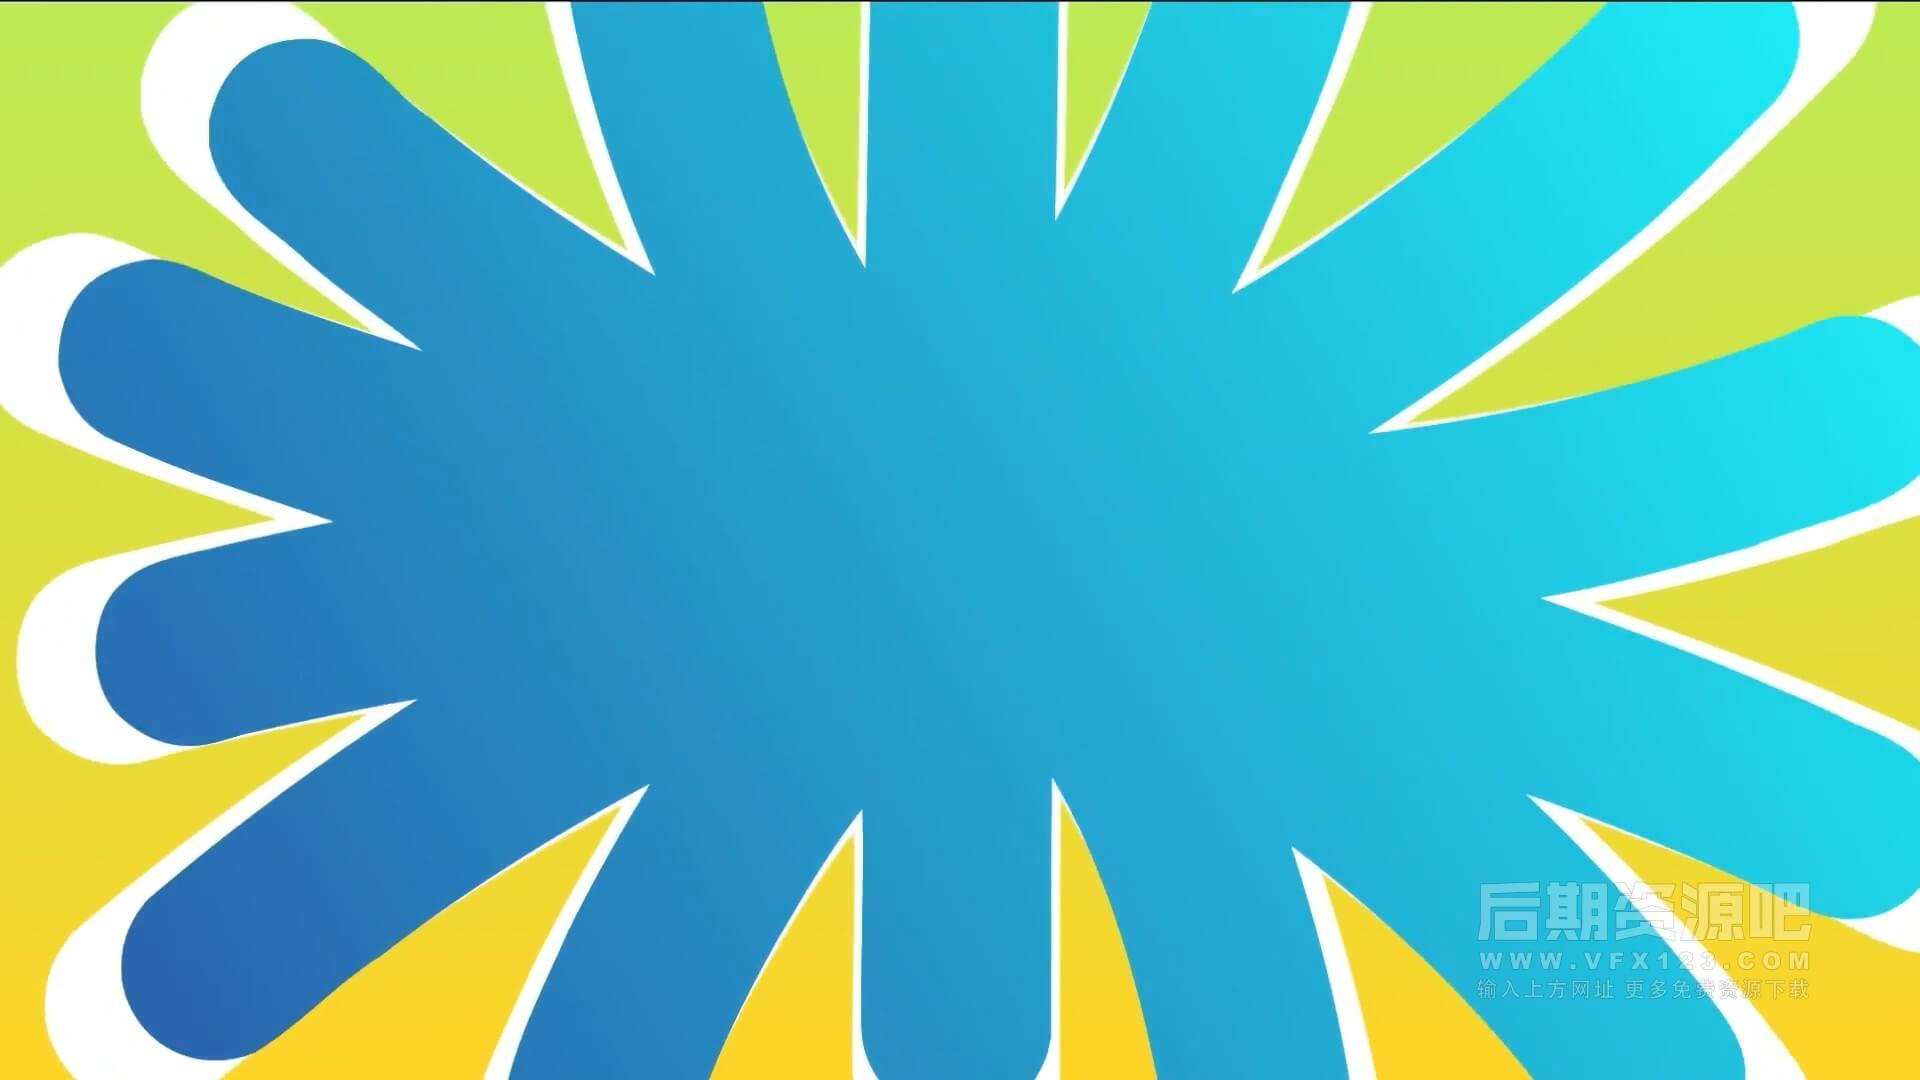 Fcpx转场插件 12组卡通多彩活力平滑过渡转场预设 Colorful Smooth Transitions